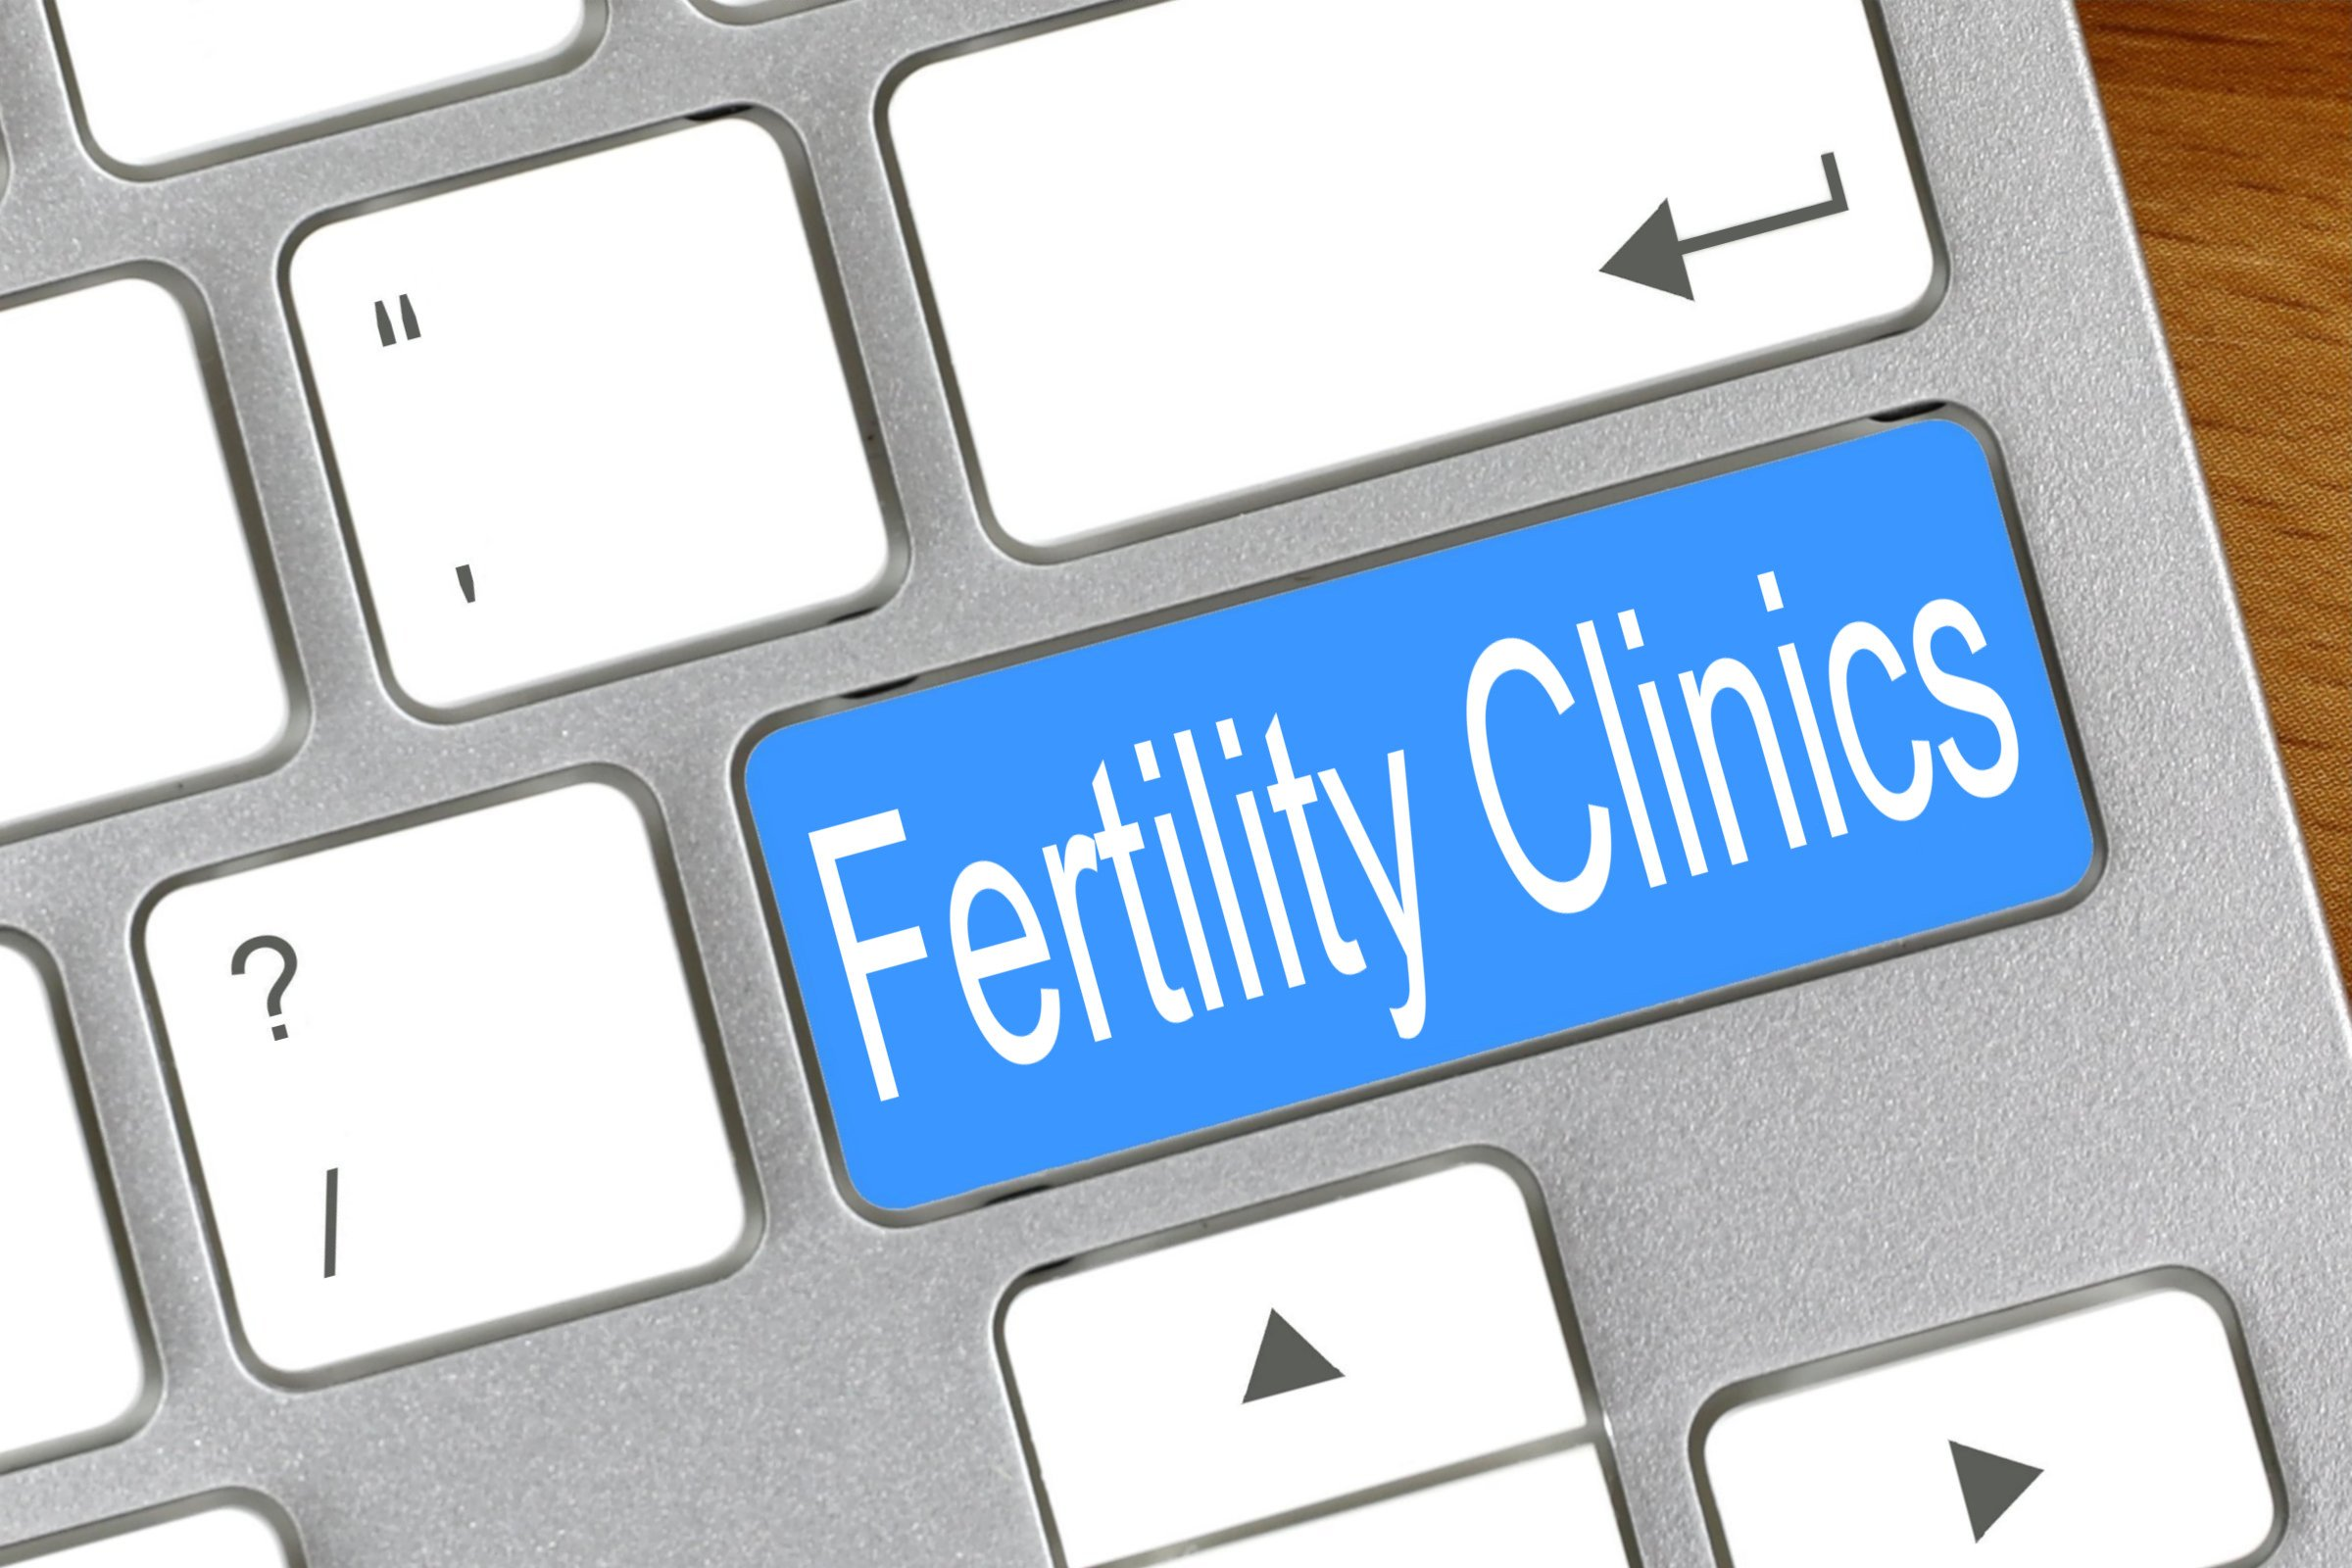 Fertility Clinics